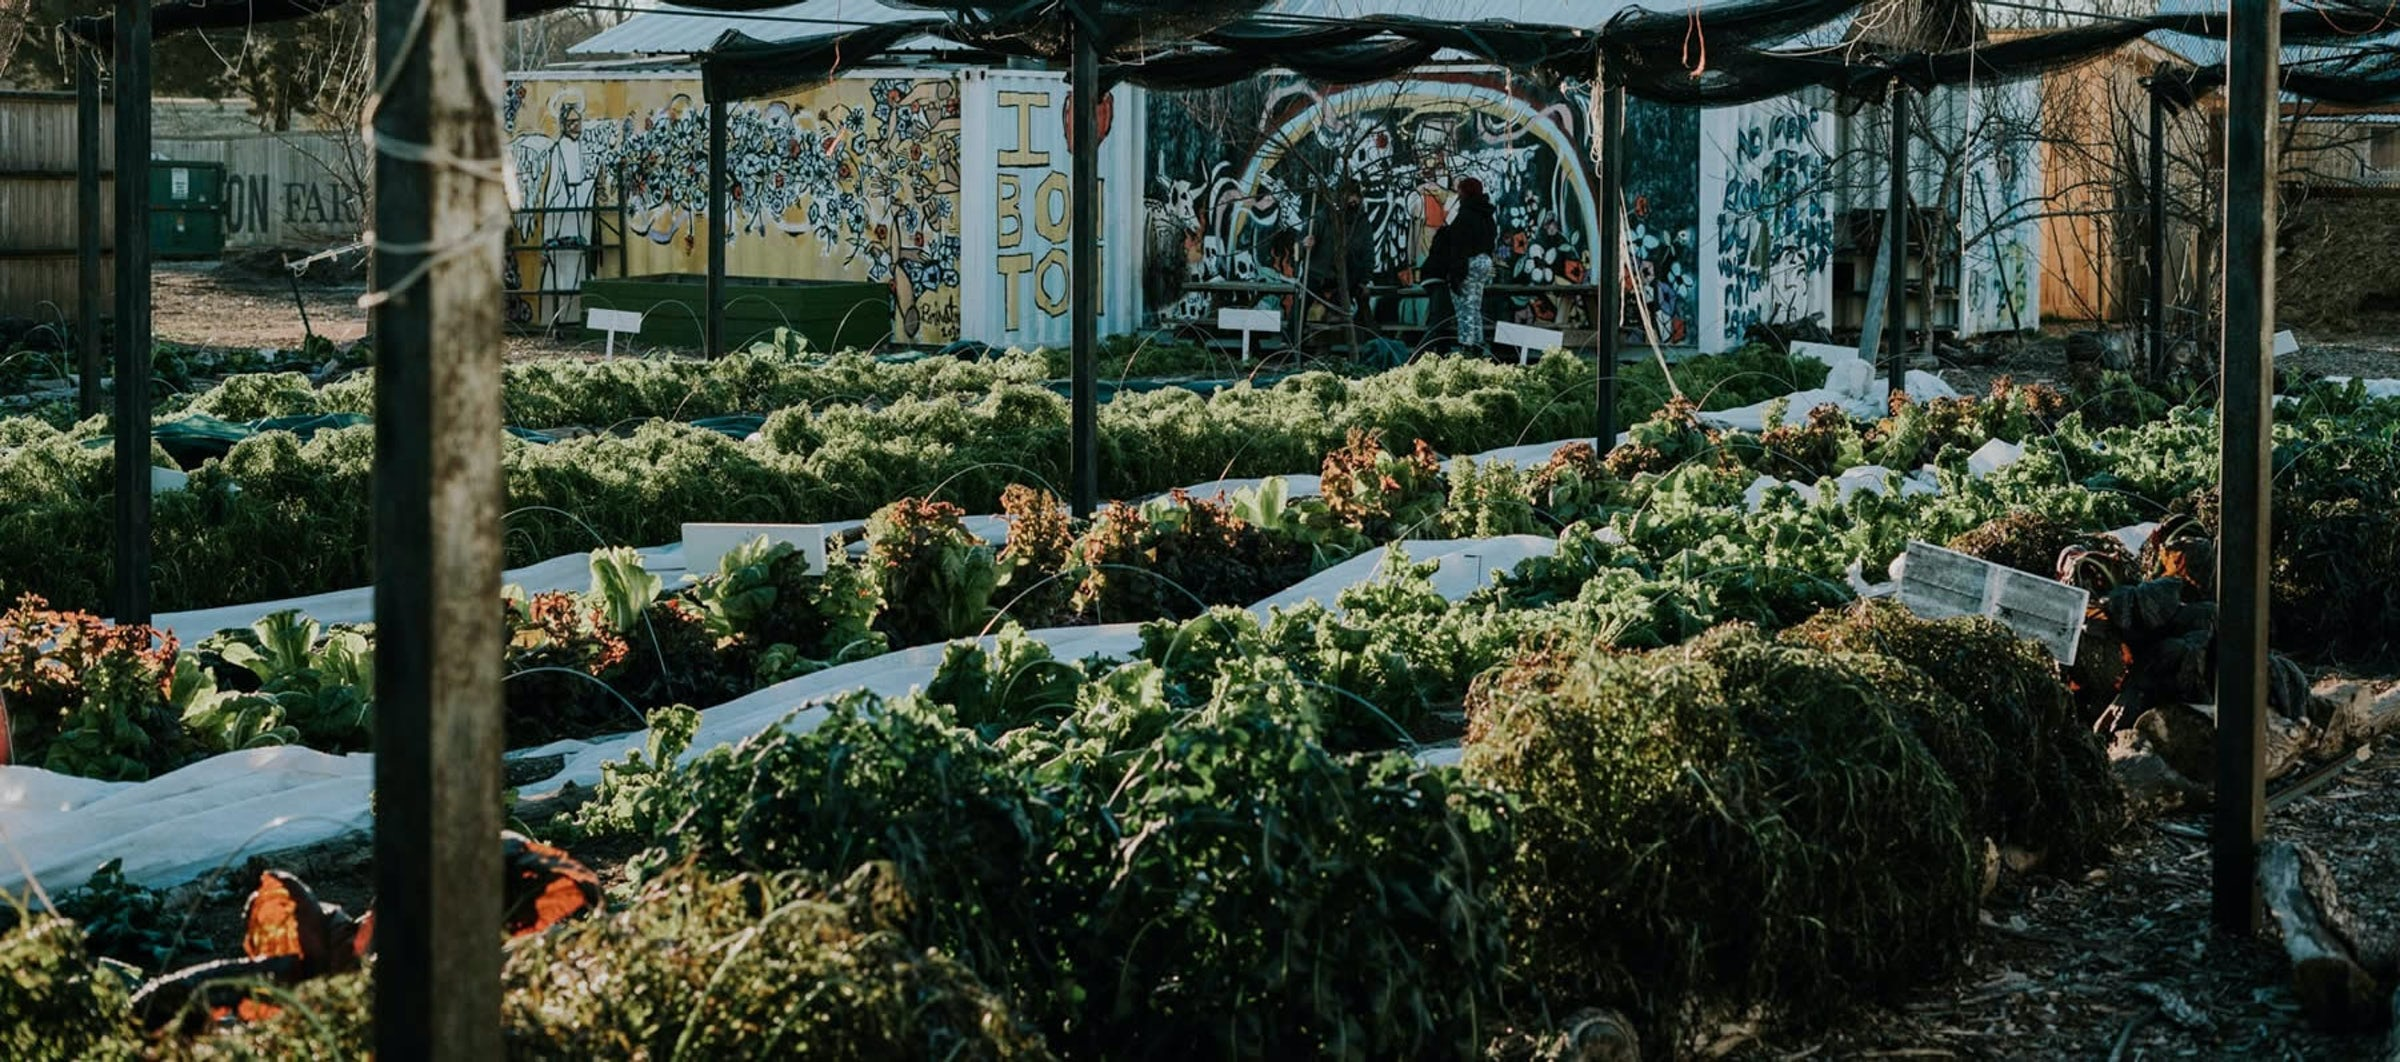 The Market at Bonton Farms in Beyond Dallas